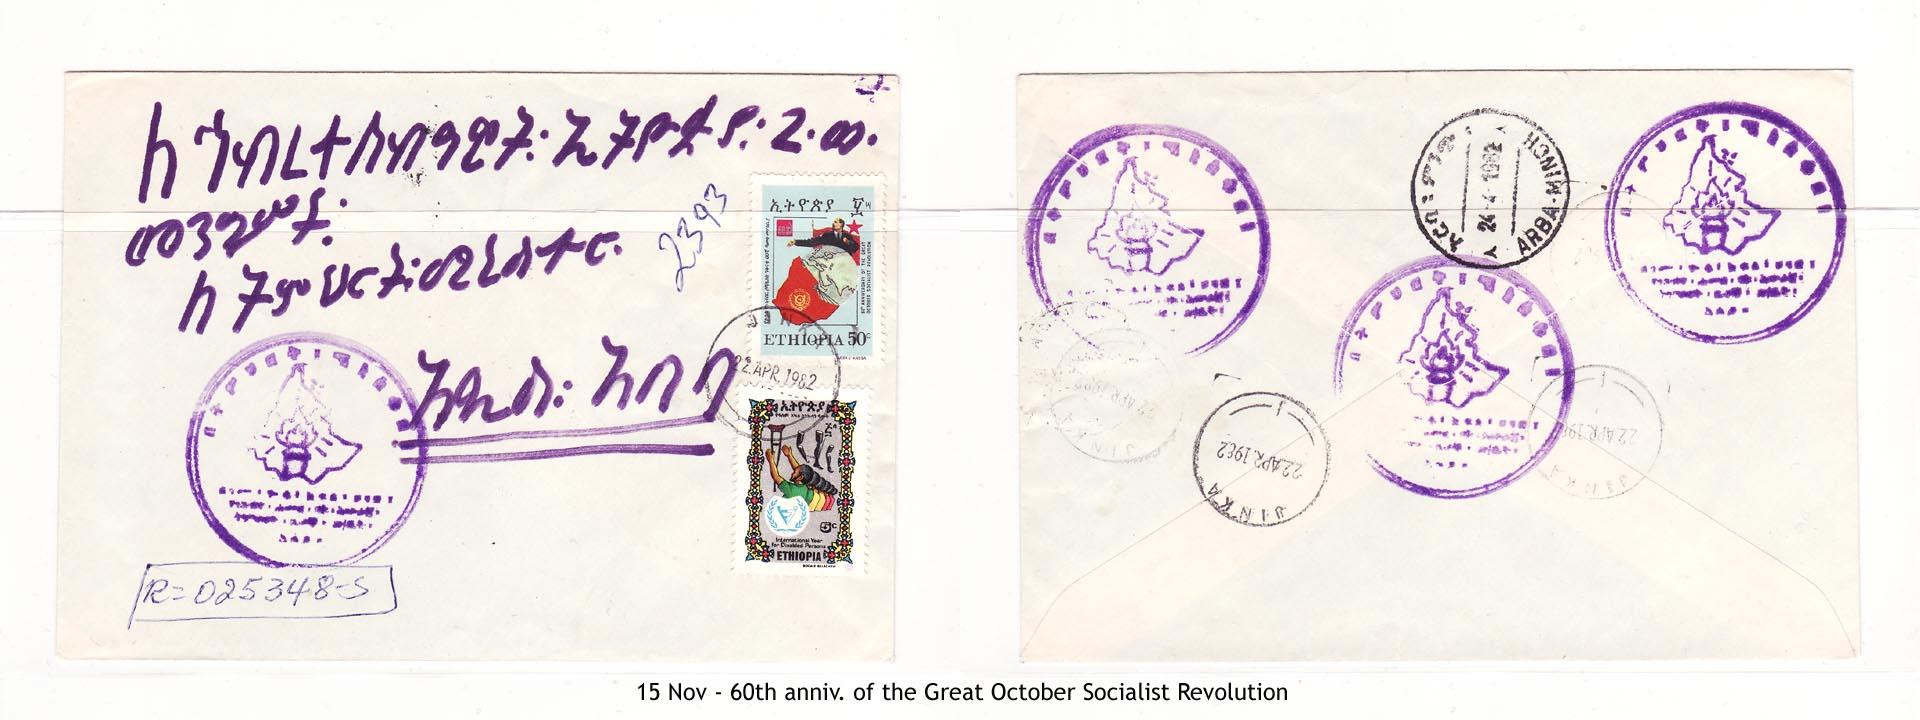 19771115 - 60th anniv. of the Great October Socialist Revolution